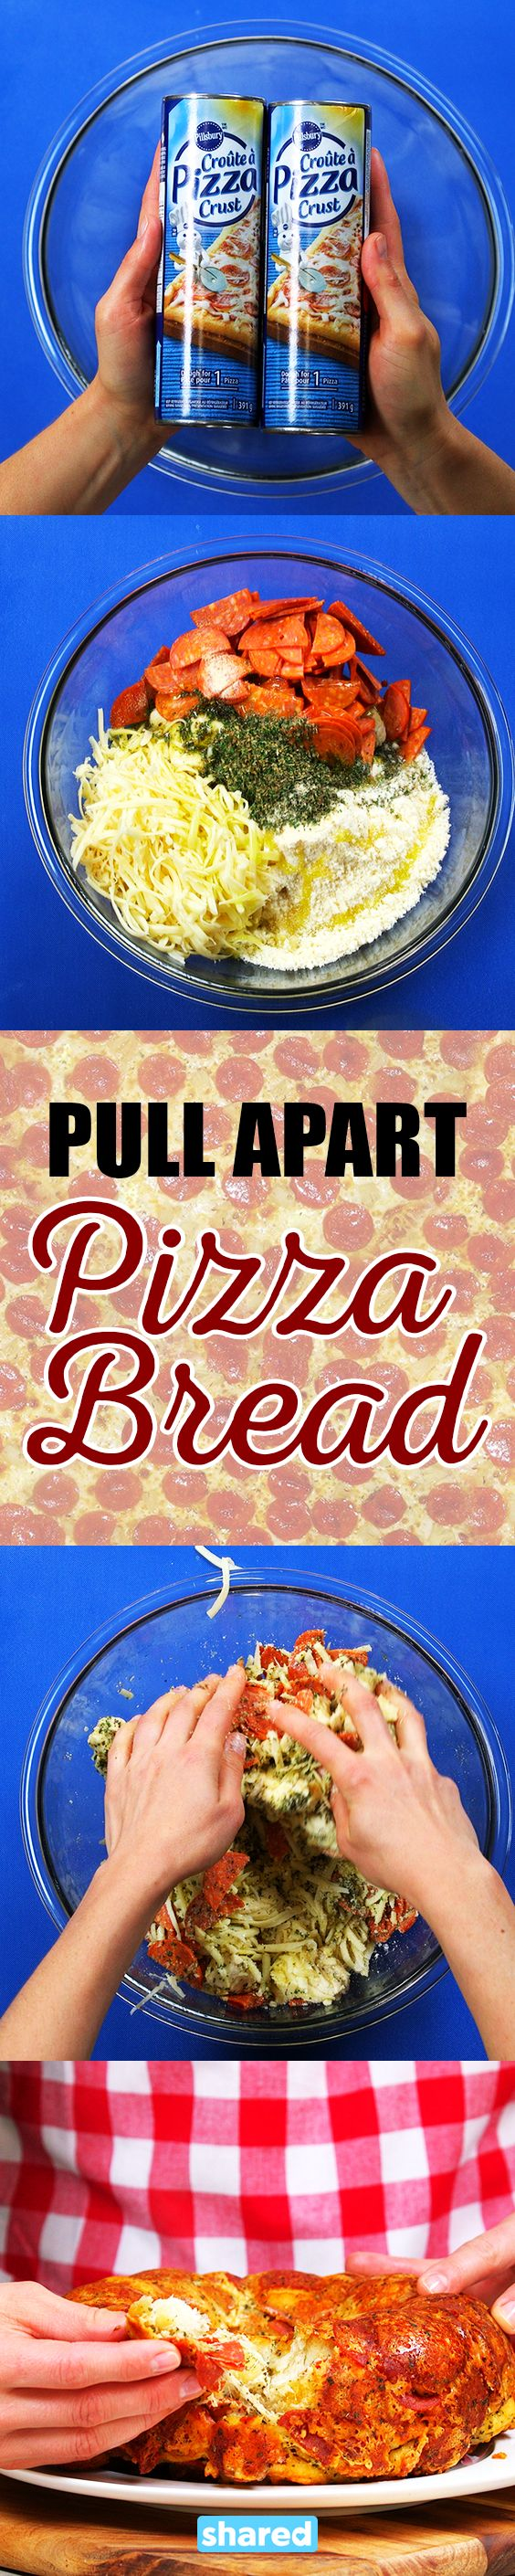 Pull Apart Pizza Bread